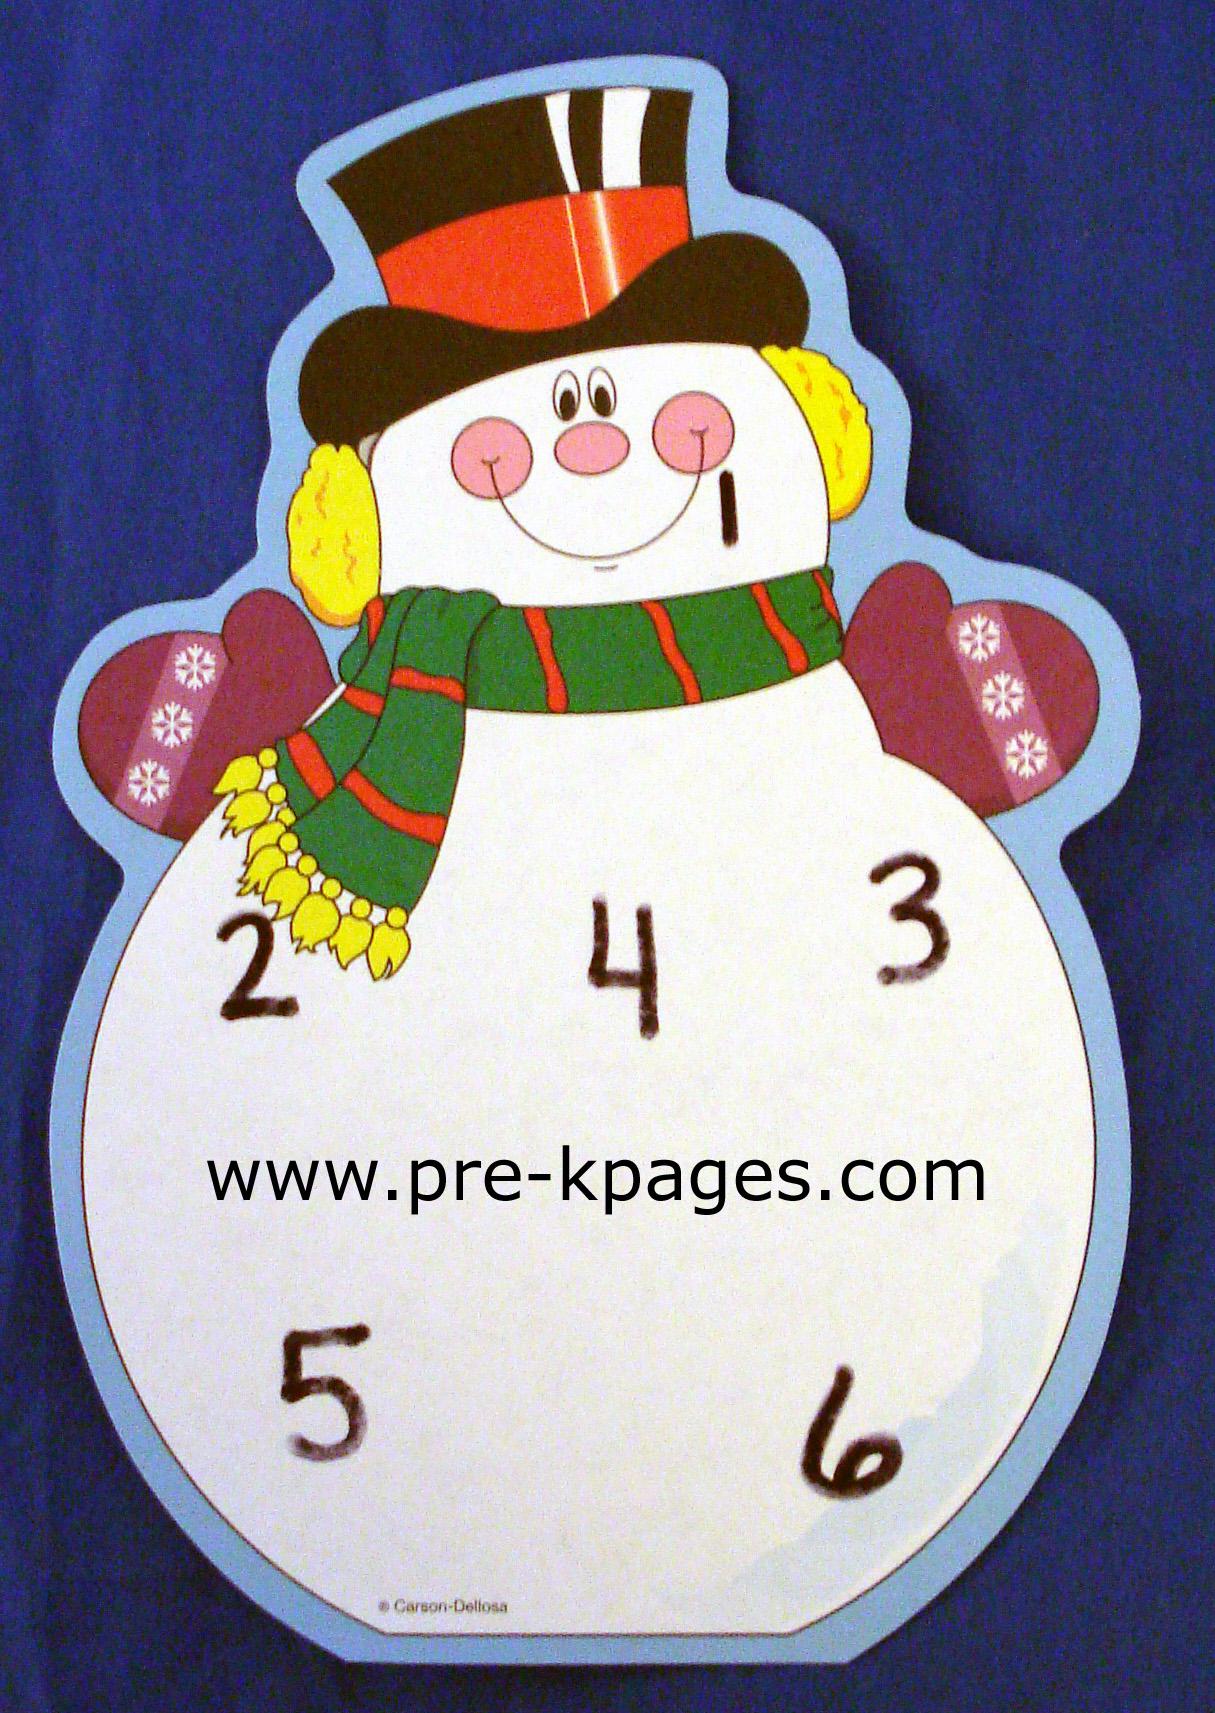 roll snowman one